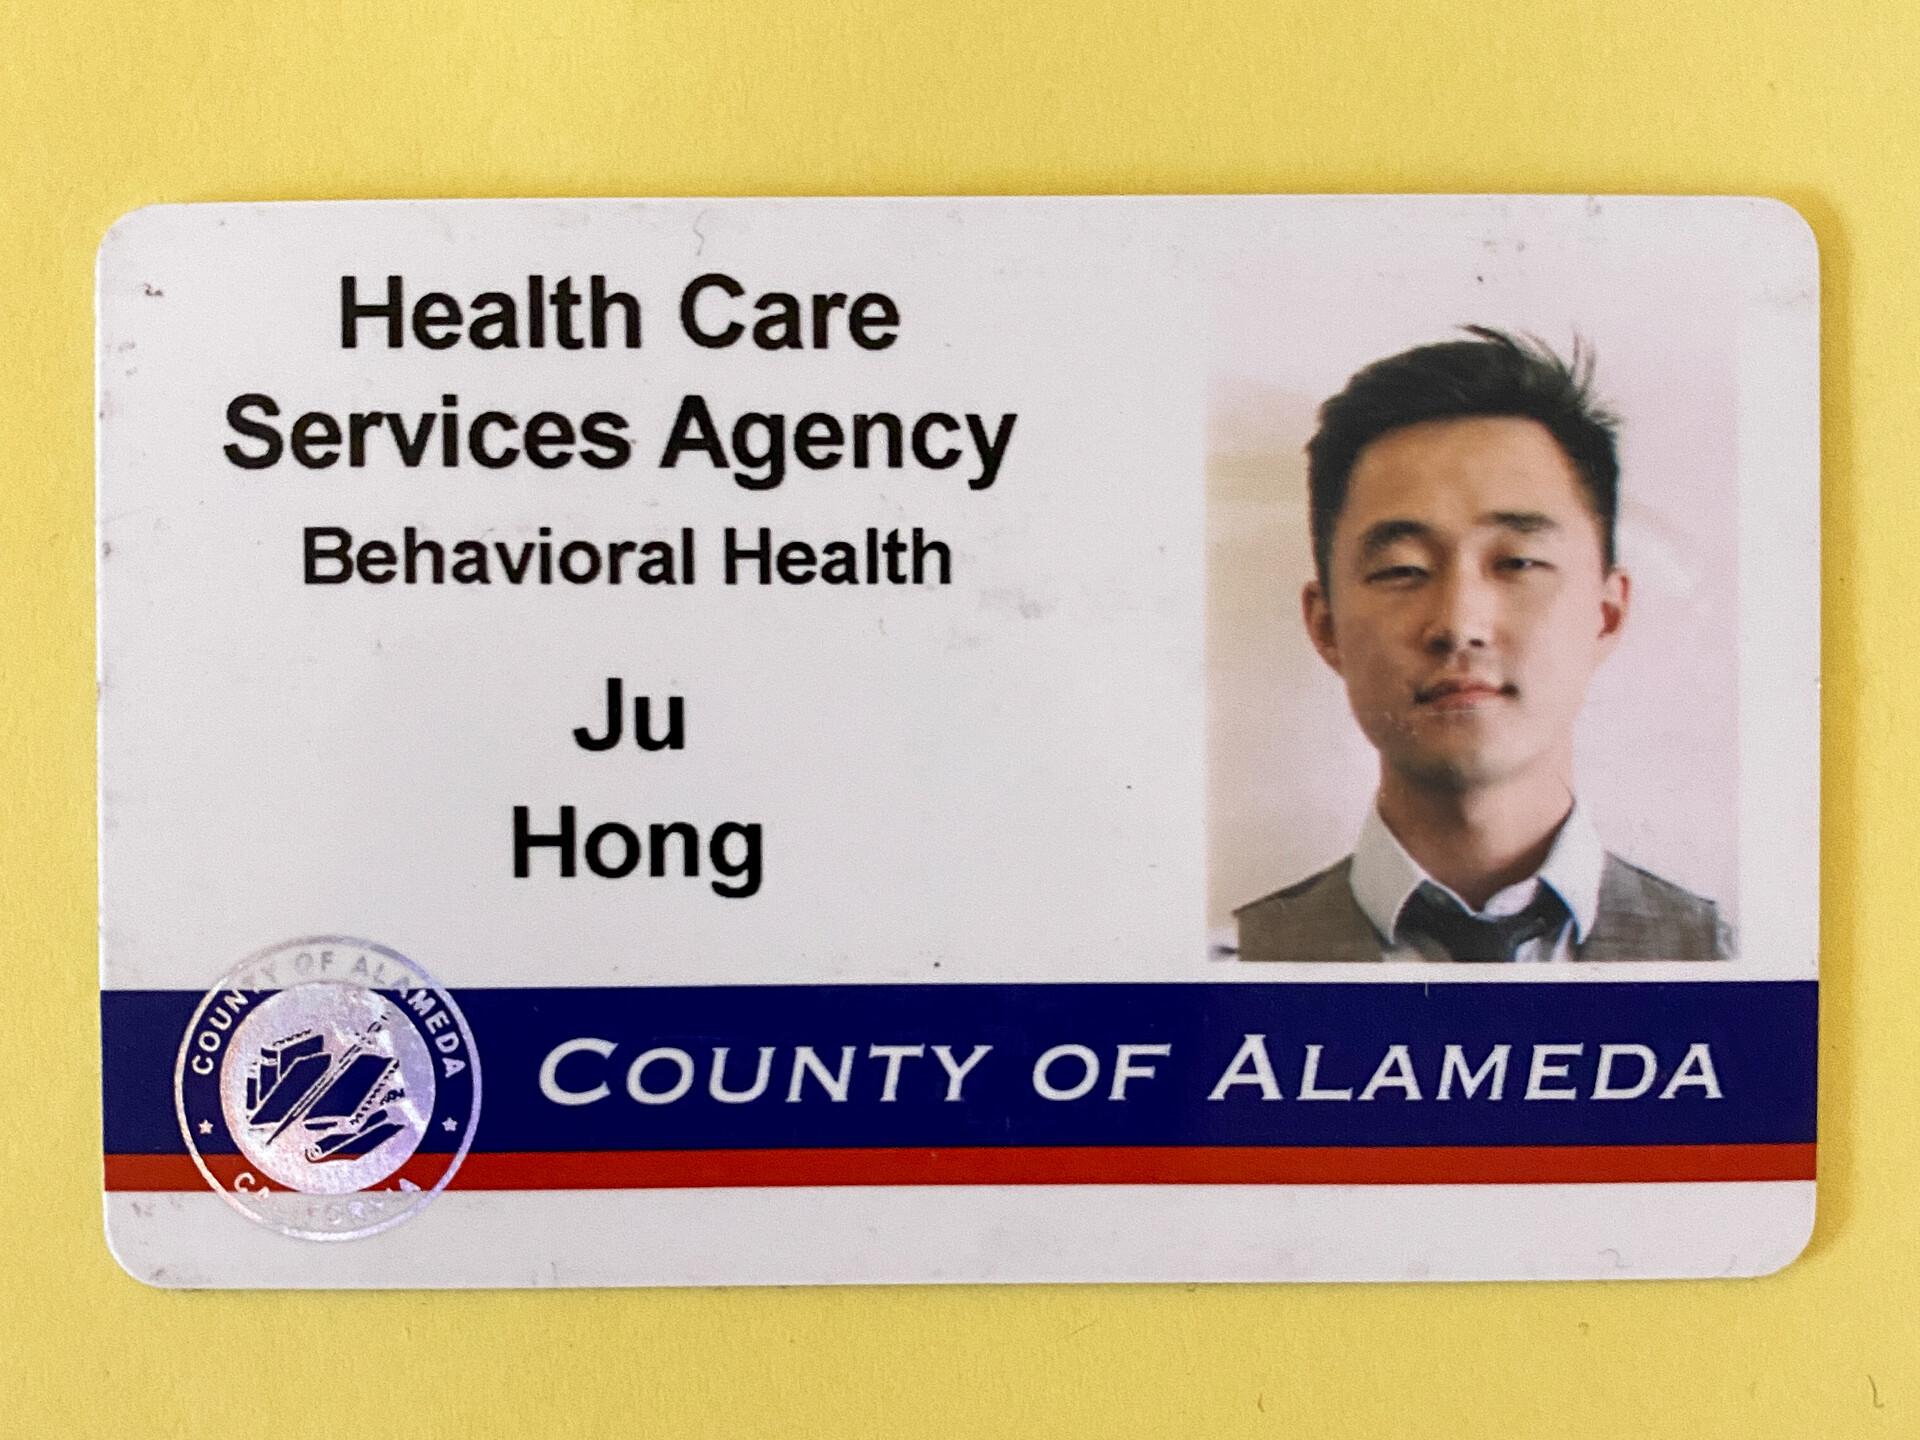 A photo ID for Ju Hong